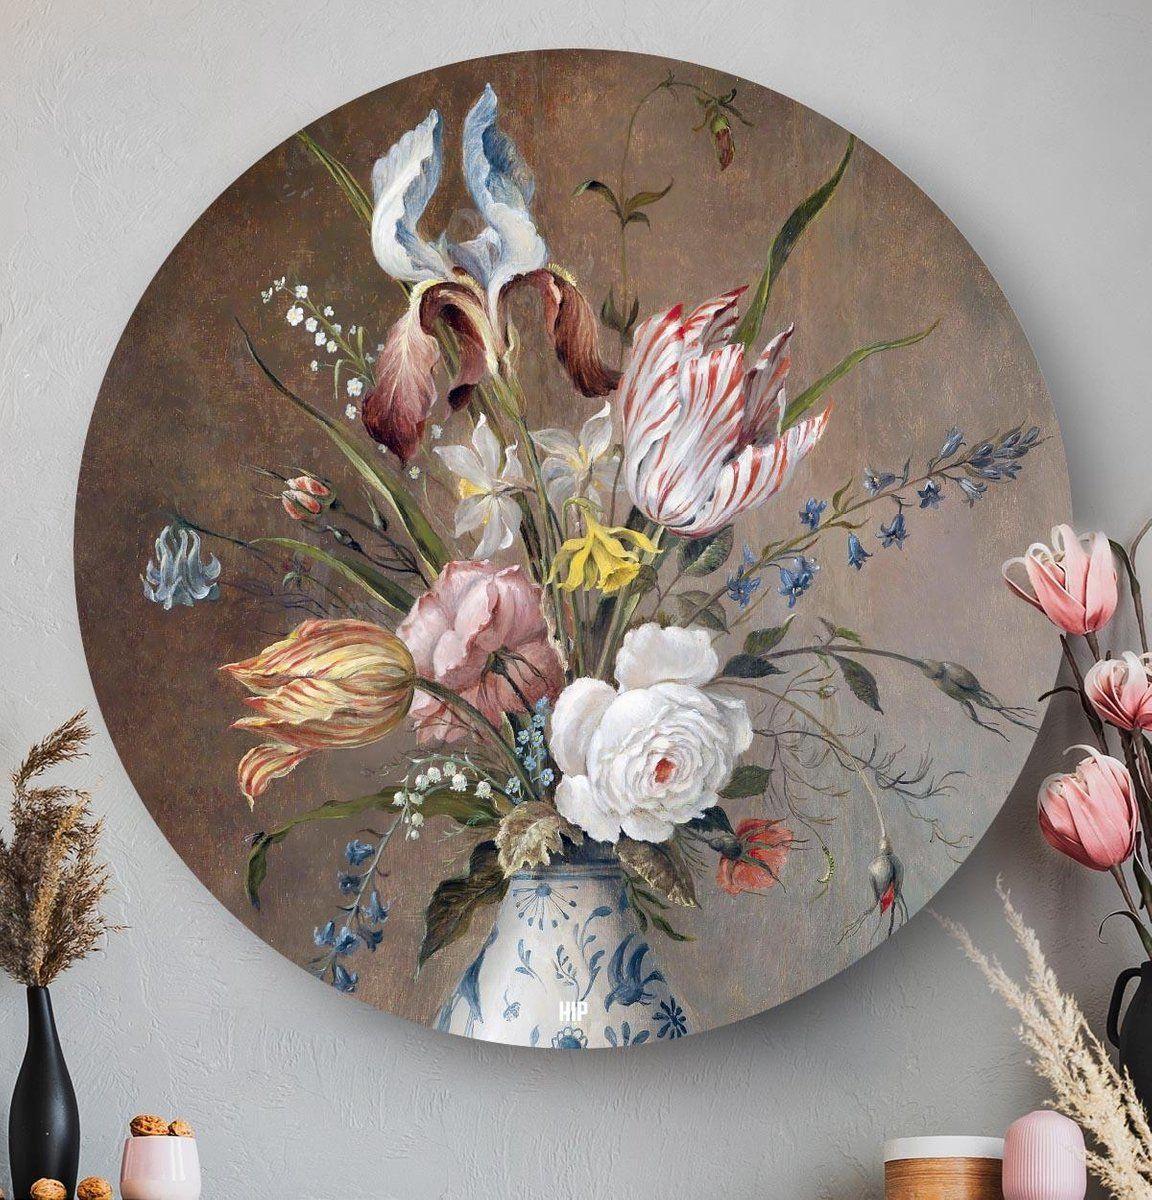 hip orgnl bloemstilleven met porseleinen vaas balthasar